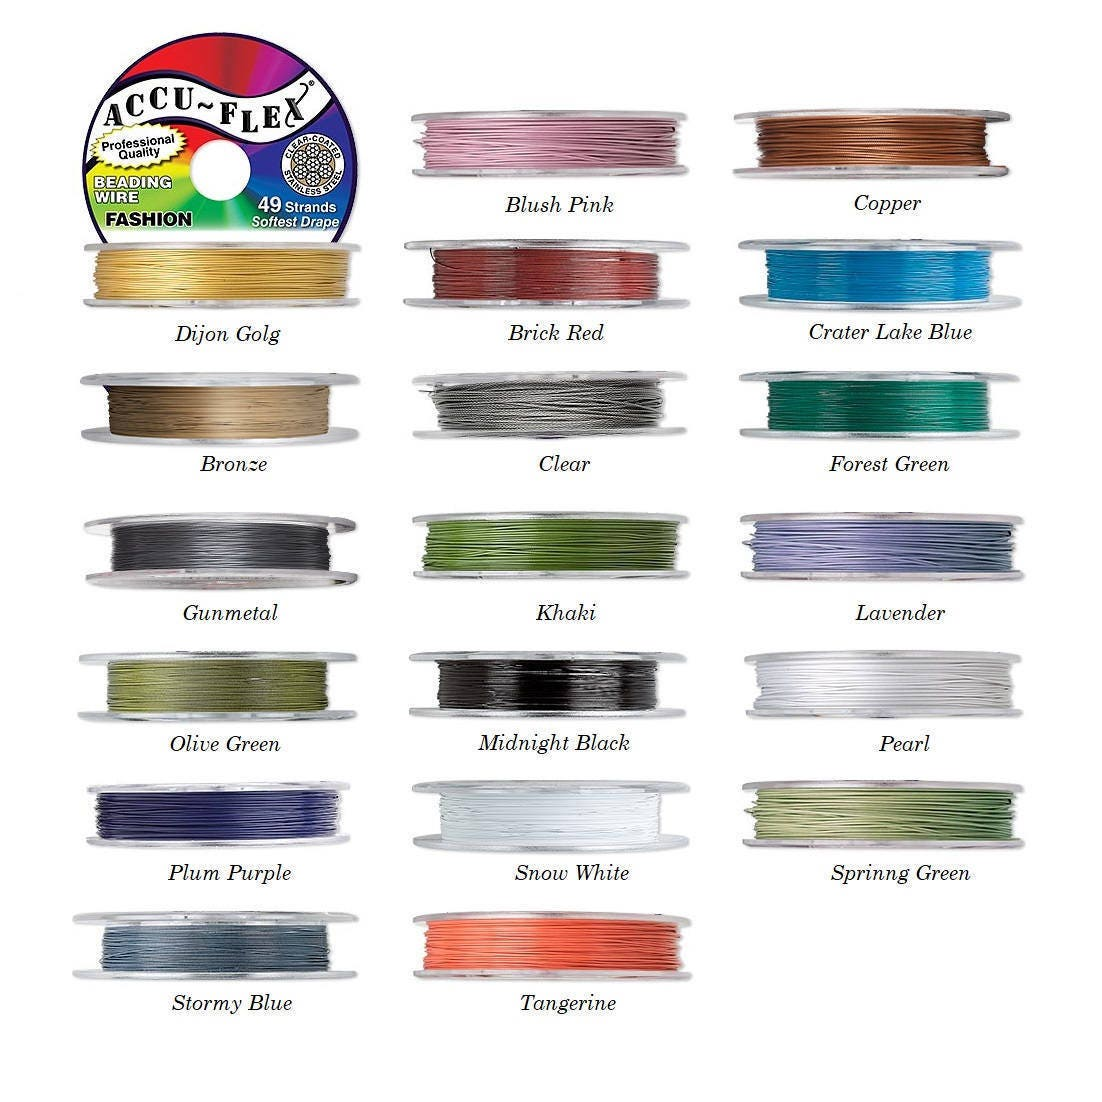 Perles accu-flex fil de 49 brins, bobine de 100 (30,48 pieds (30,48 100 m) 49 brins Accu-flex perles fil 0,019 pouces (0,48 mm) de diamètre, fil Accu-flex. 22e036